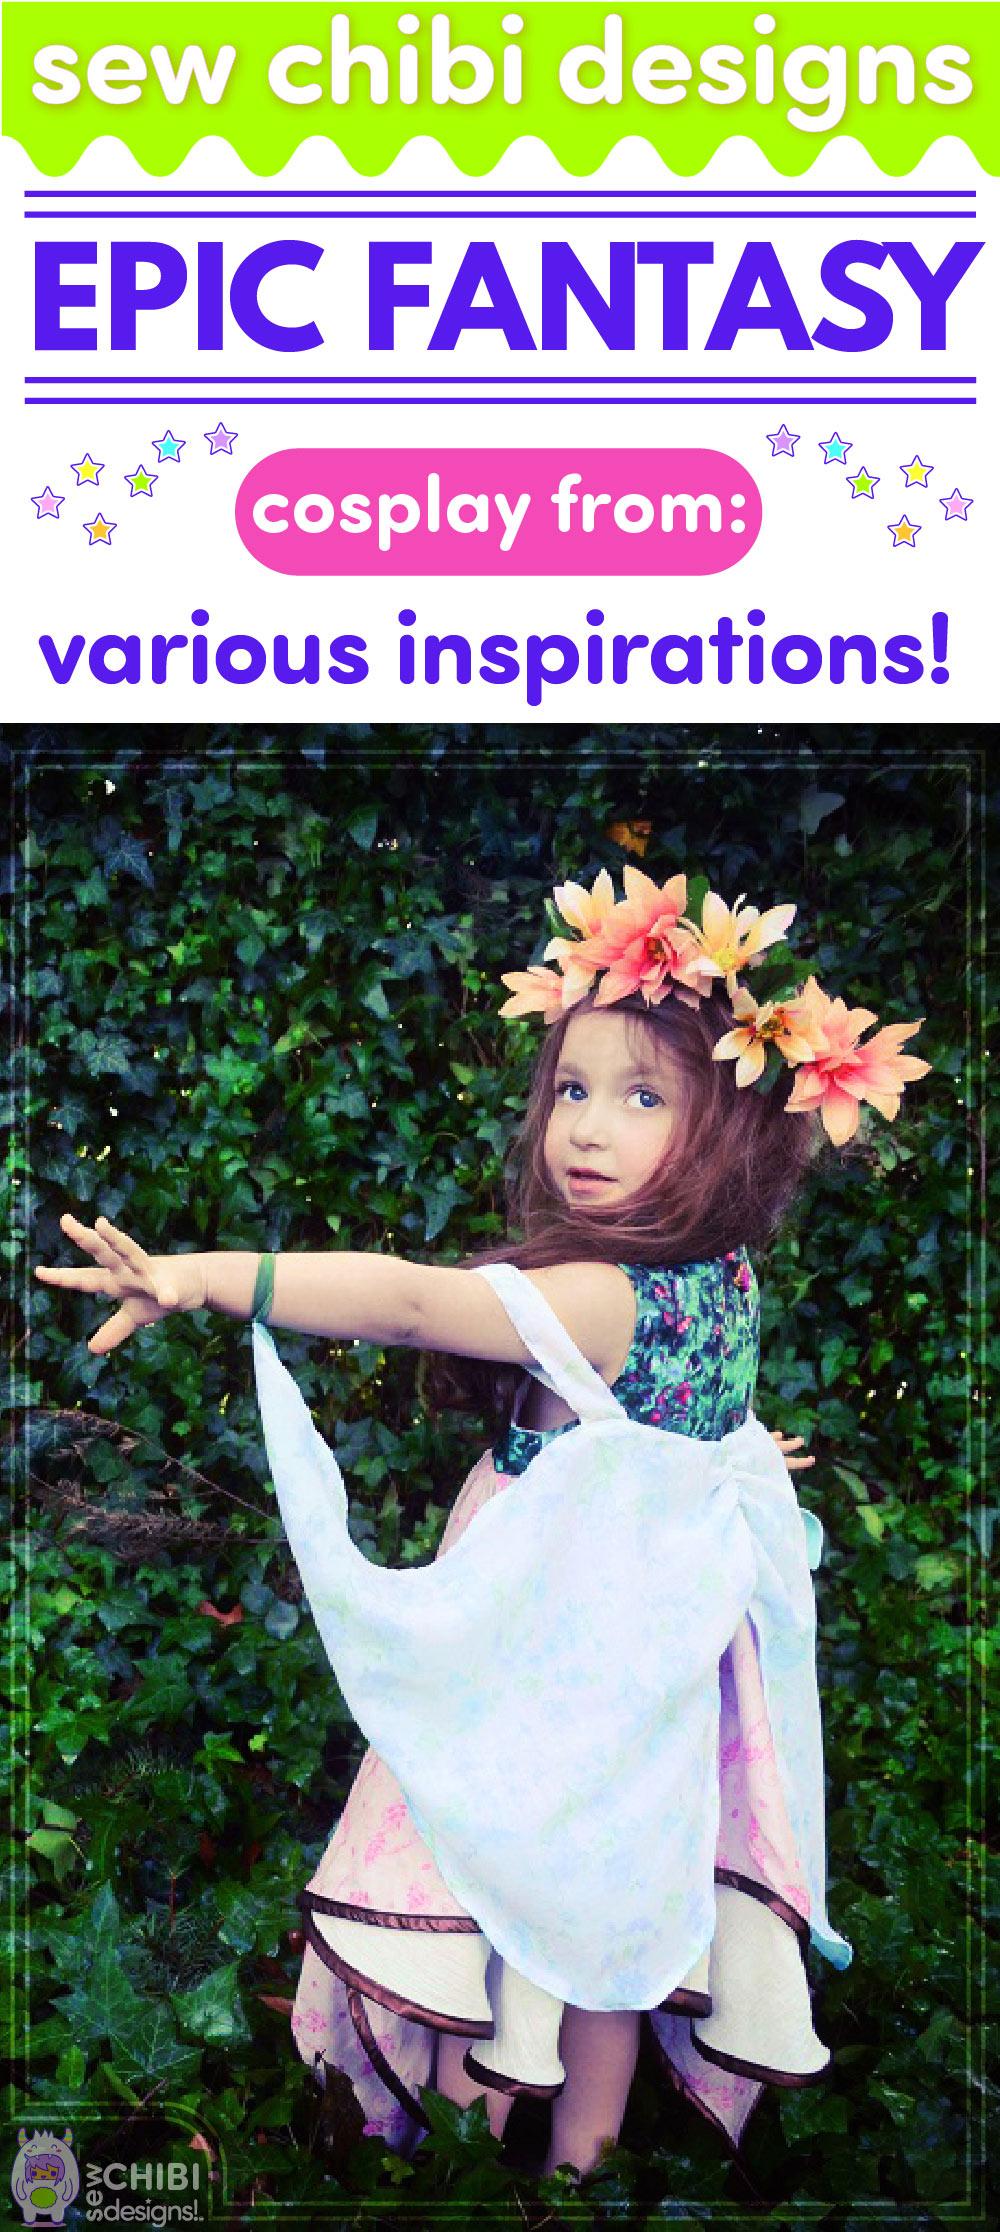 Epic Fantasy Fairy Faerie Cherub chibi cosplay sewn by Sew Chibi Designs for Sew Geeky